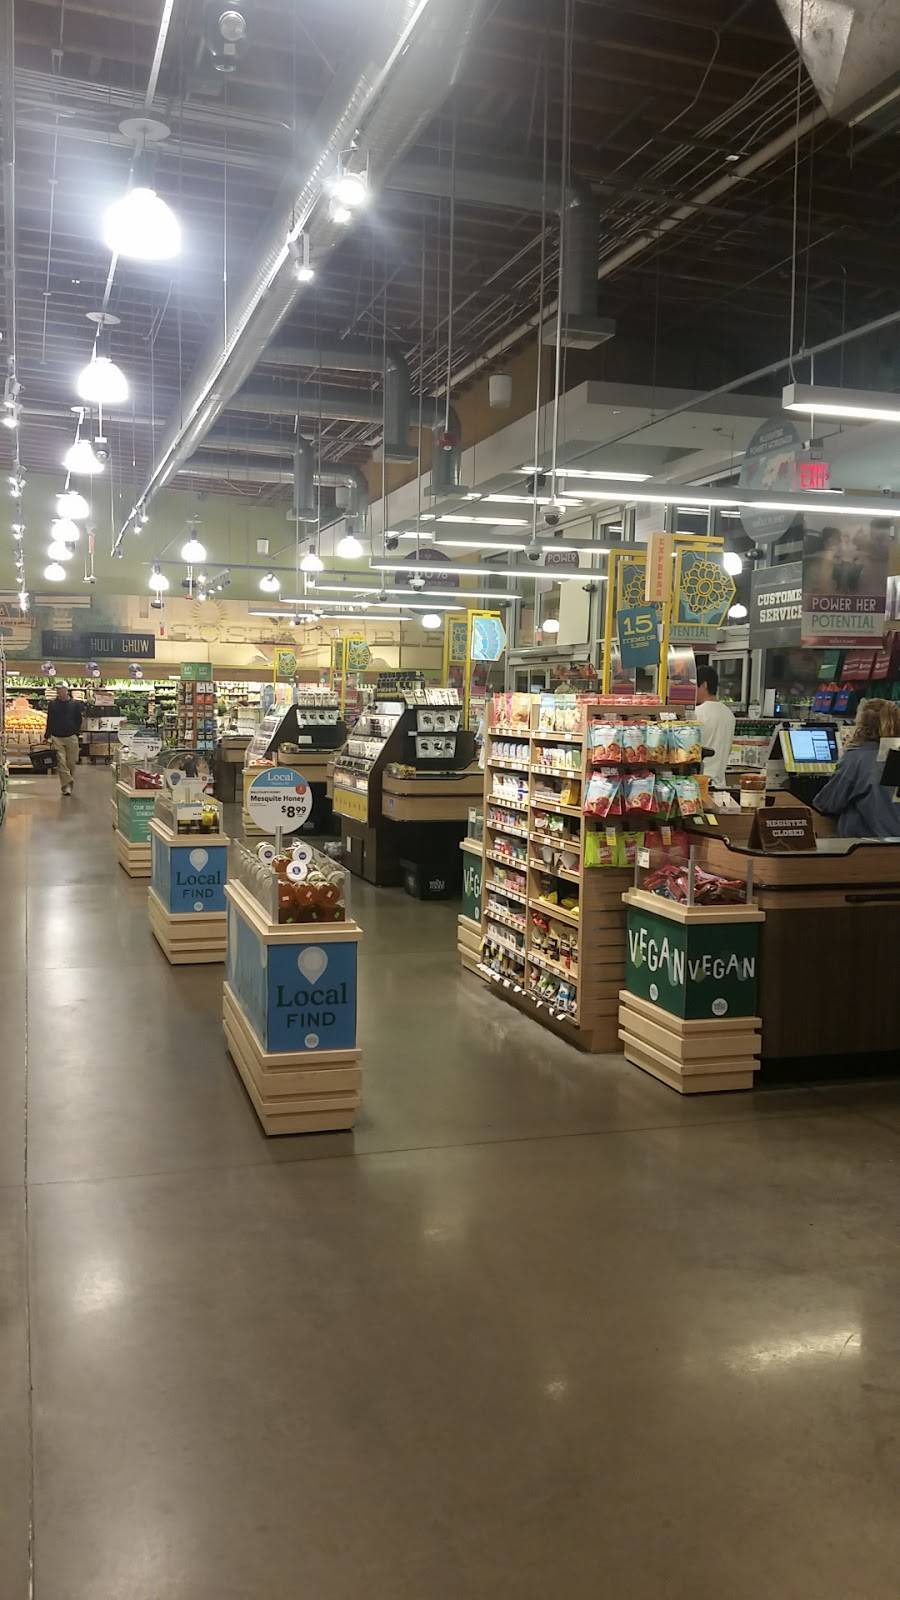 Whole Foods Market - supermarket  | Photo 5 of 10 | Address: 5555 E River Rd, Tucson, AZ 85750, USA | Phone: (520) 461-1300